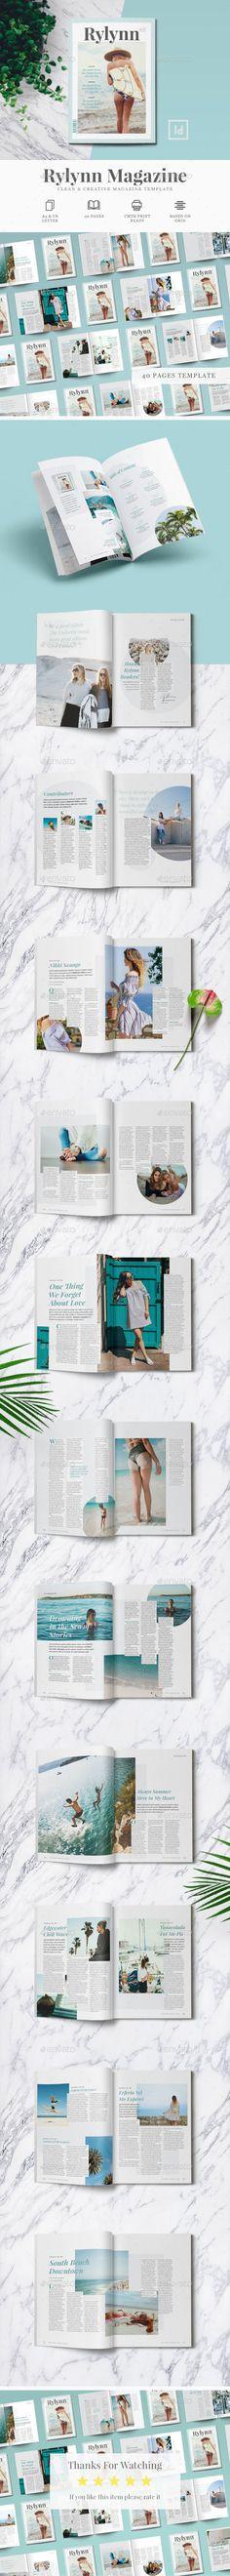 Creative Magazine Layout Tempate Design